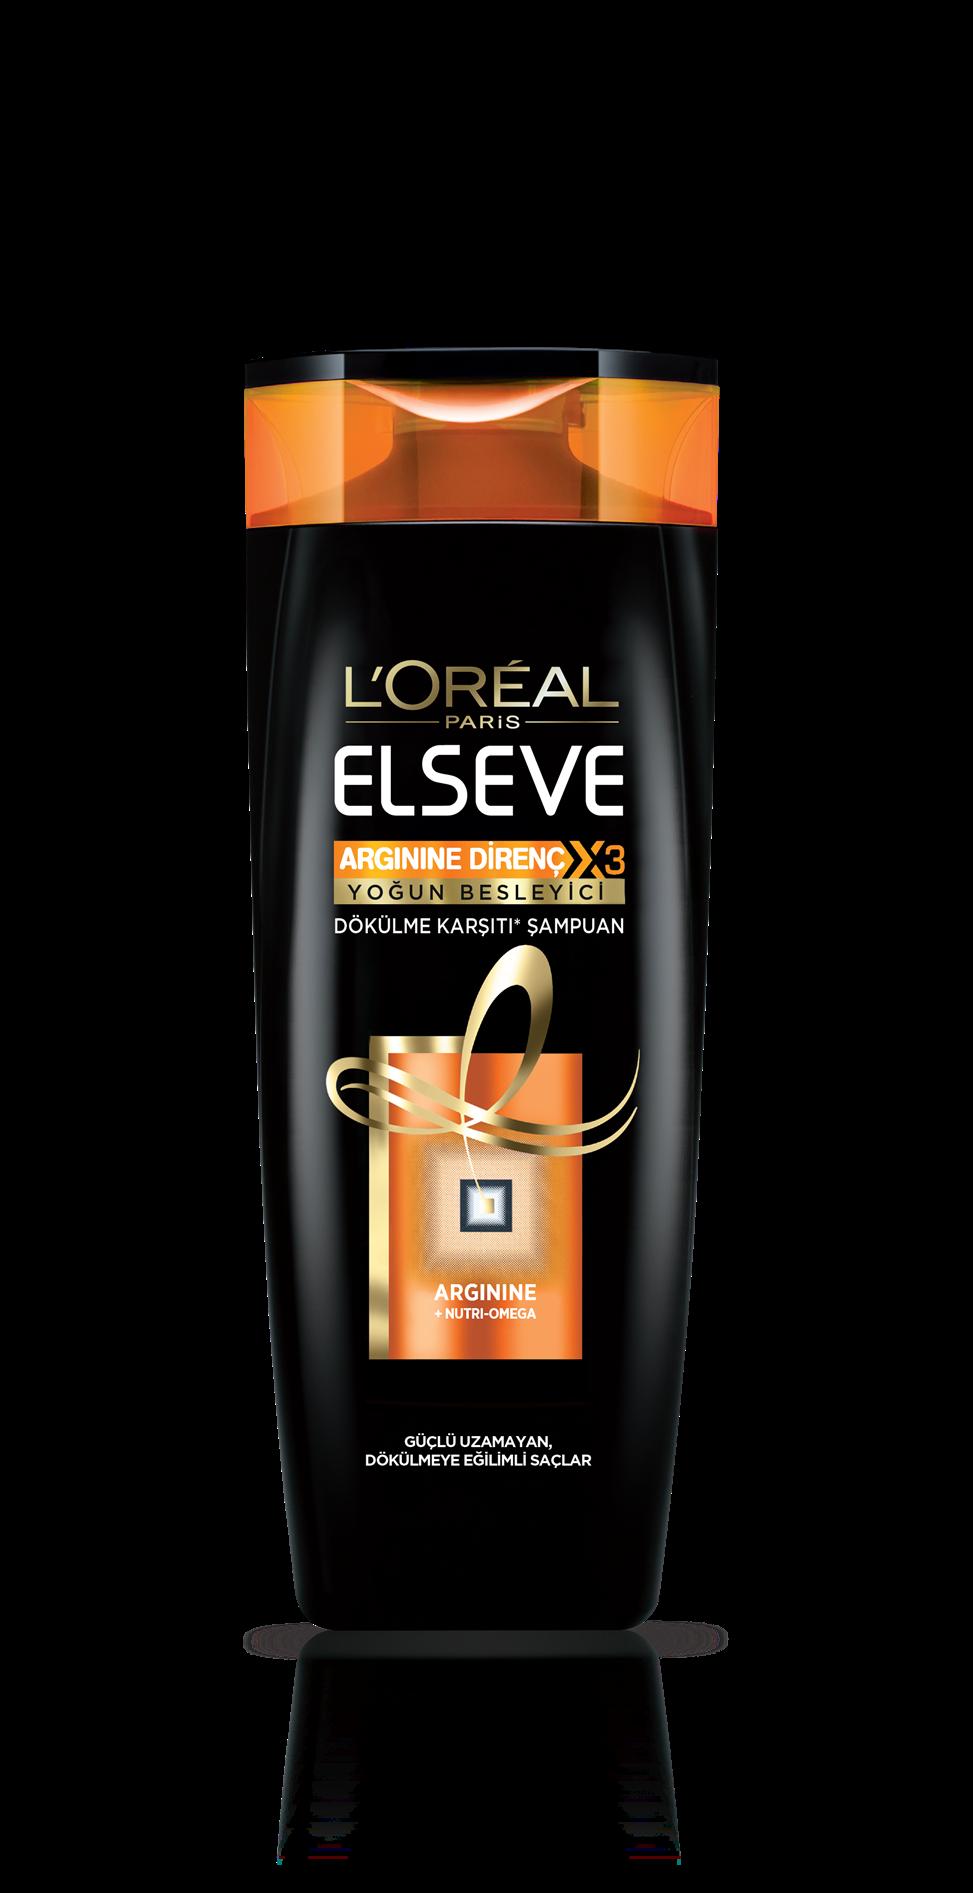 L'Oréal Paris Elseve Arginine Yoğun Besleyici Şampuan